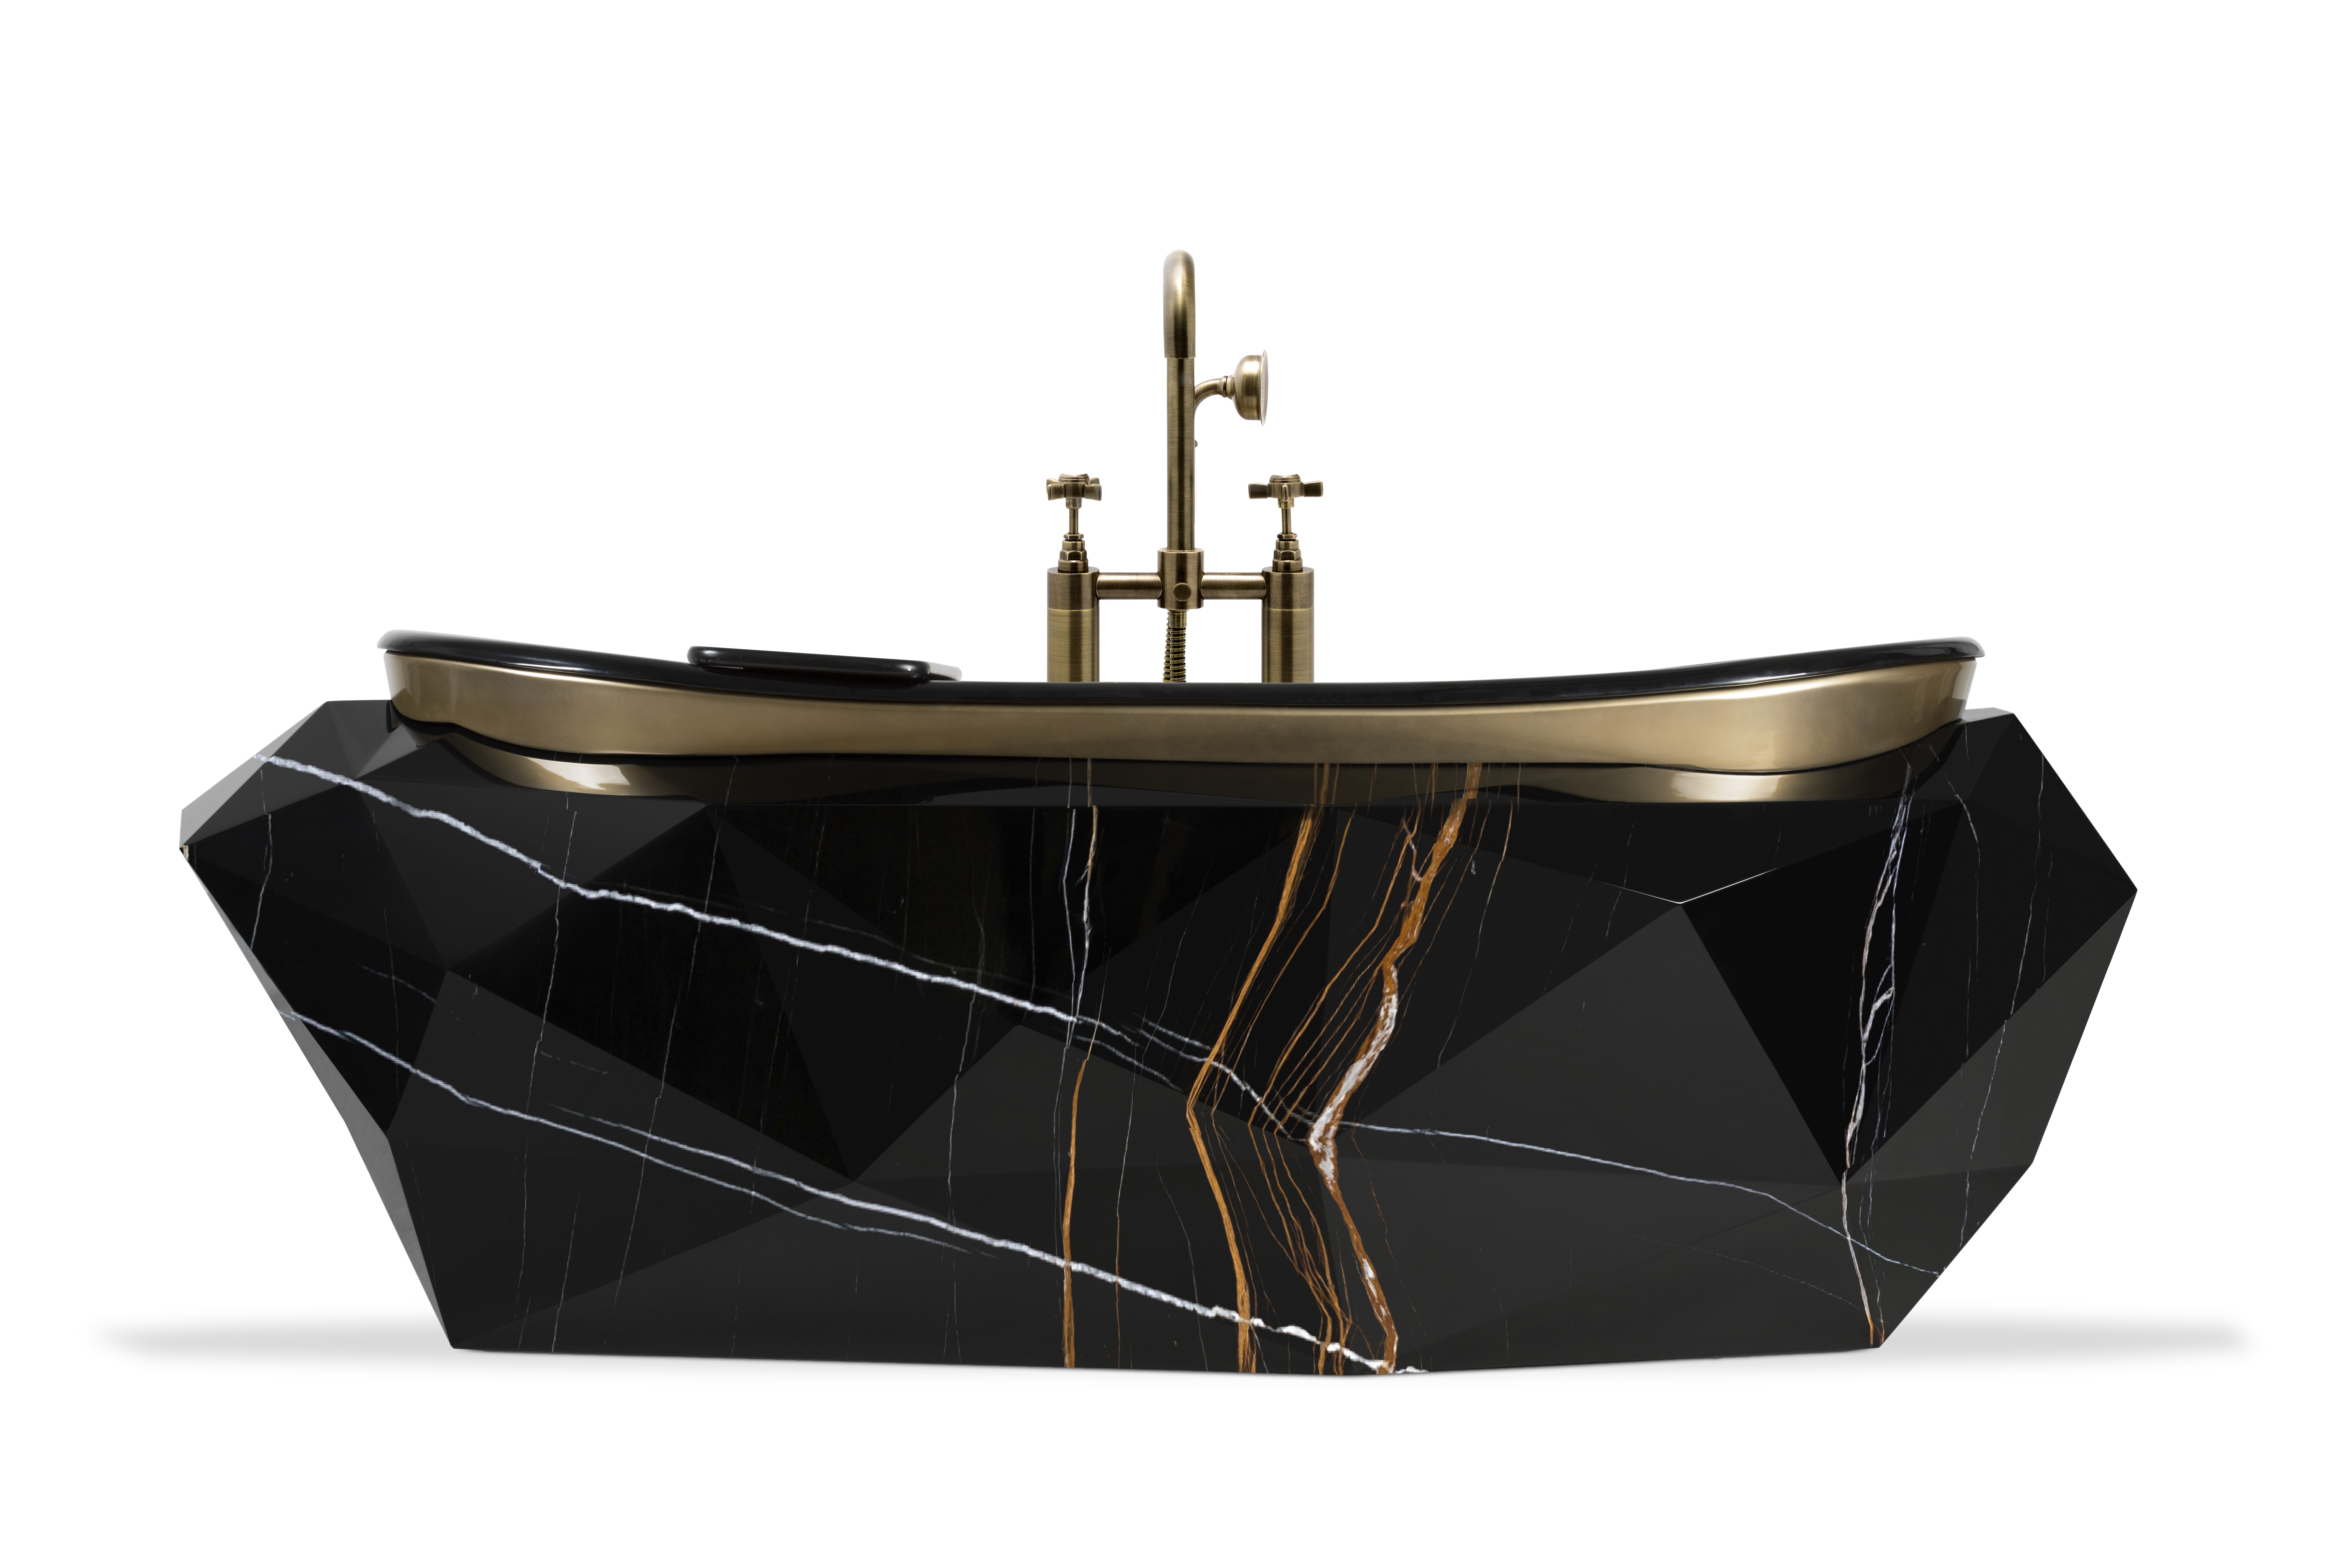 e-book The Stunning Bathroom Project Inside Maison Valentina E-Book diamond faux marble bathtub 1 HR